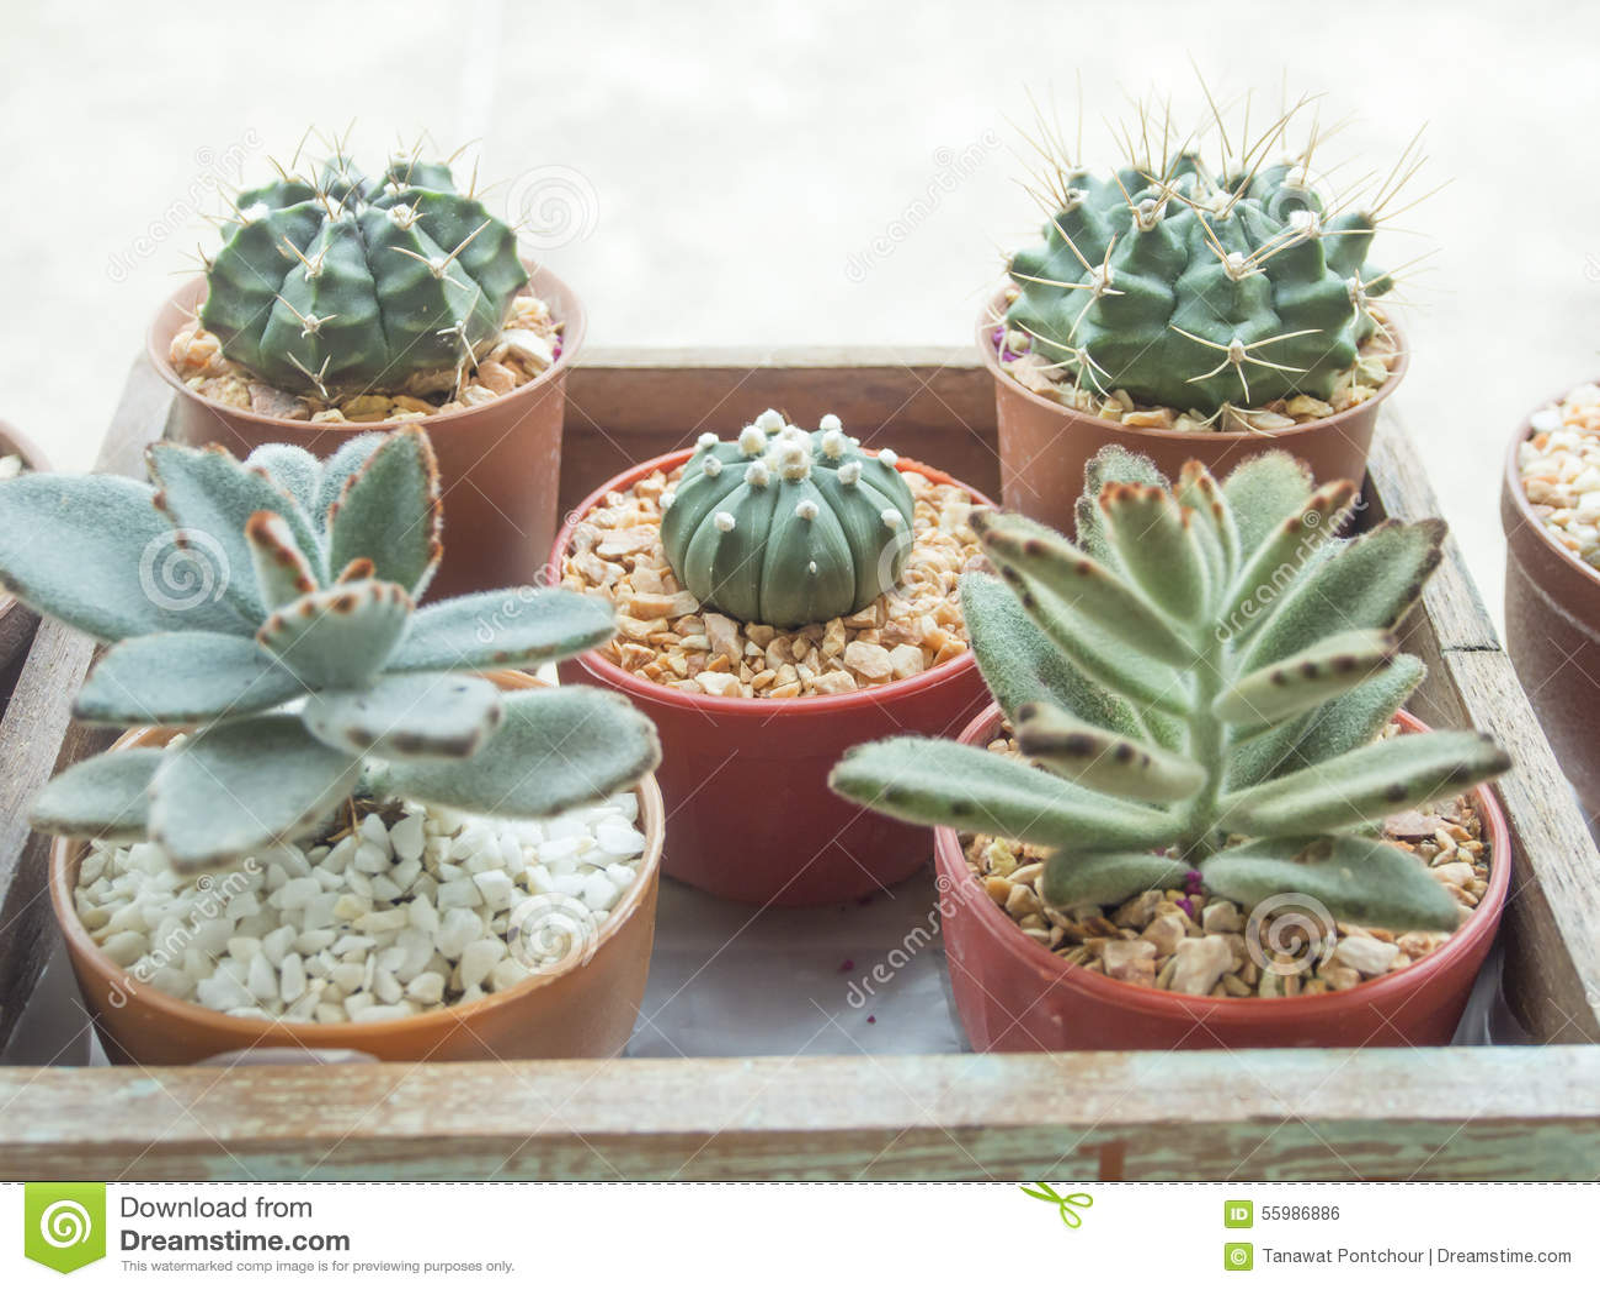 jardin d 39 int rieur de cactus photo stock image 55986886. Black Bedroom Furniture Sets. Home Design Ideas